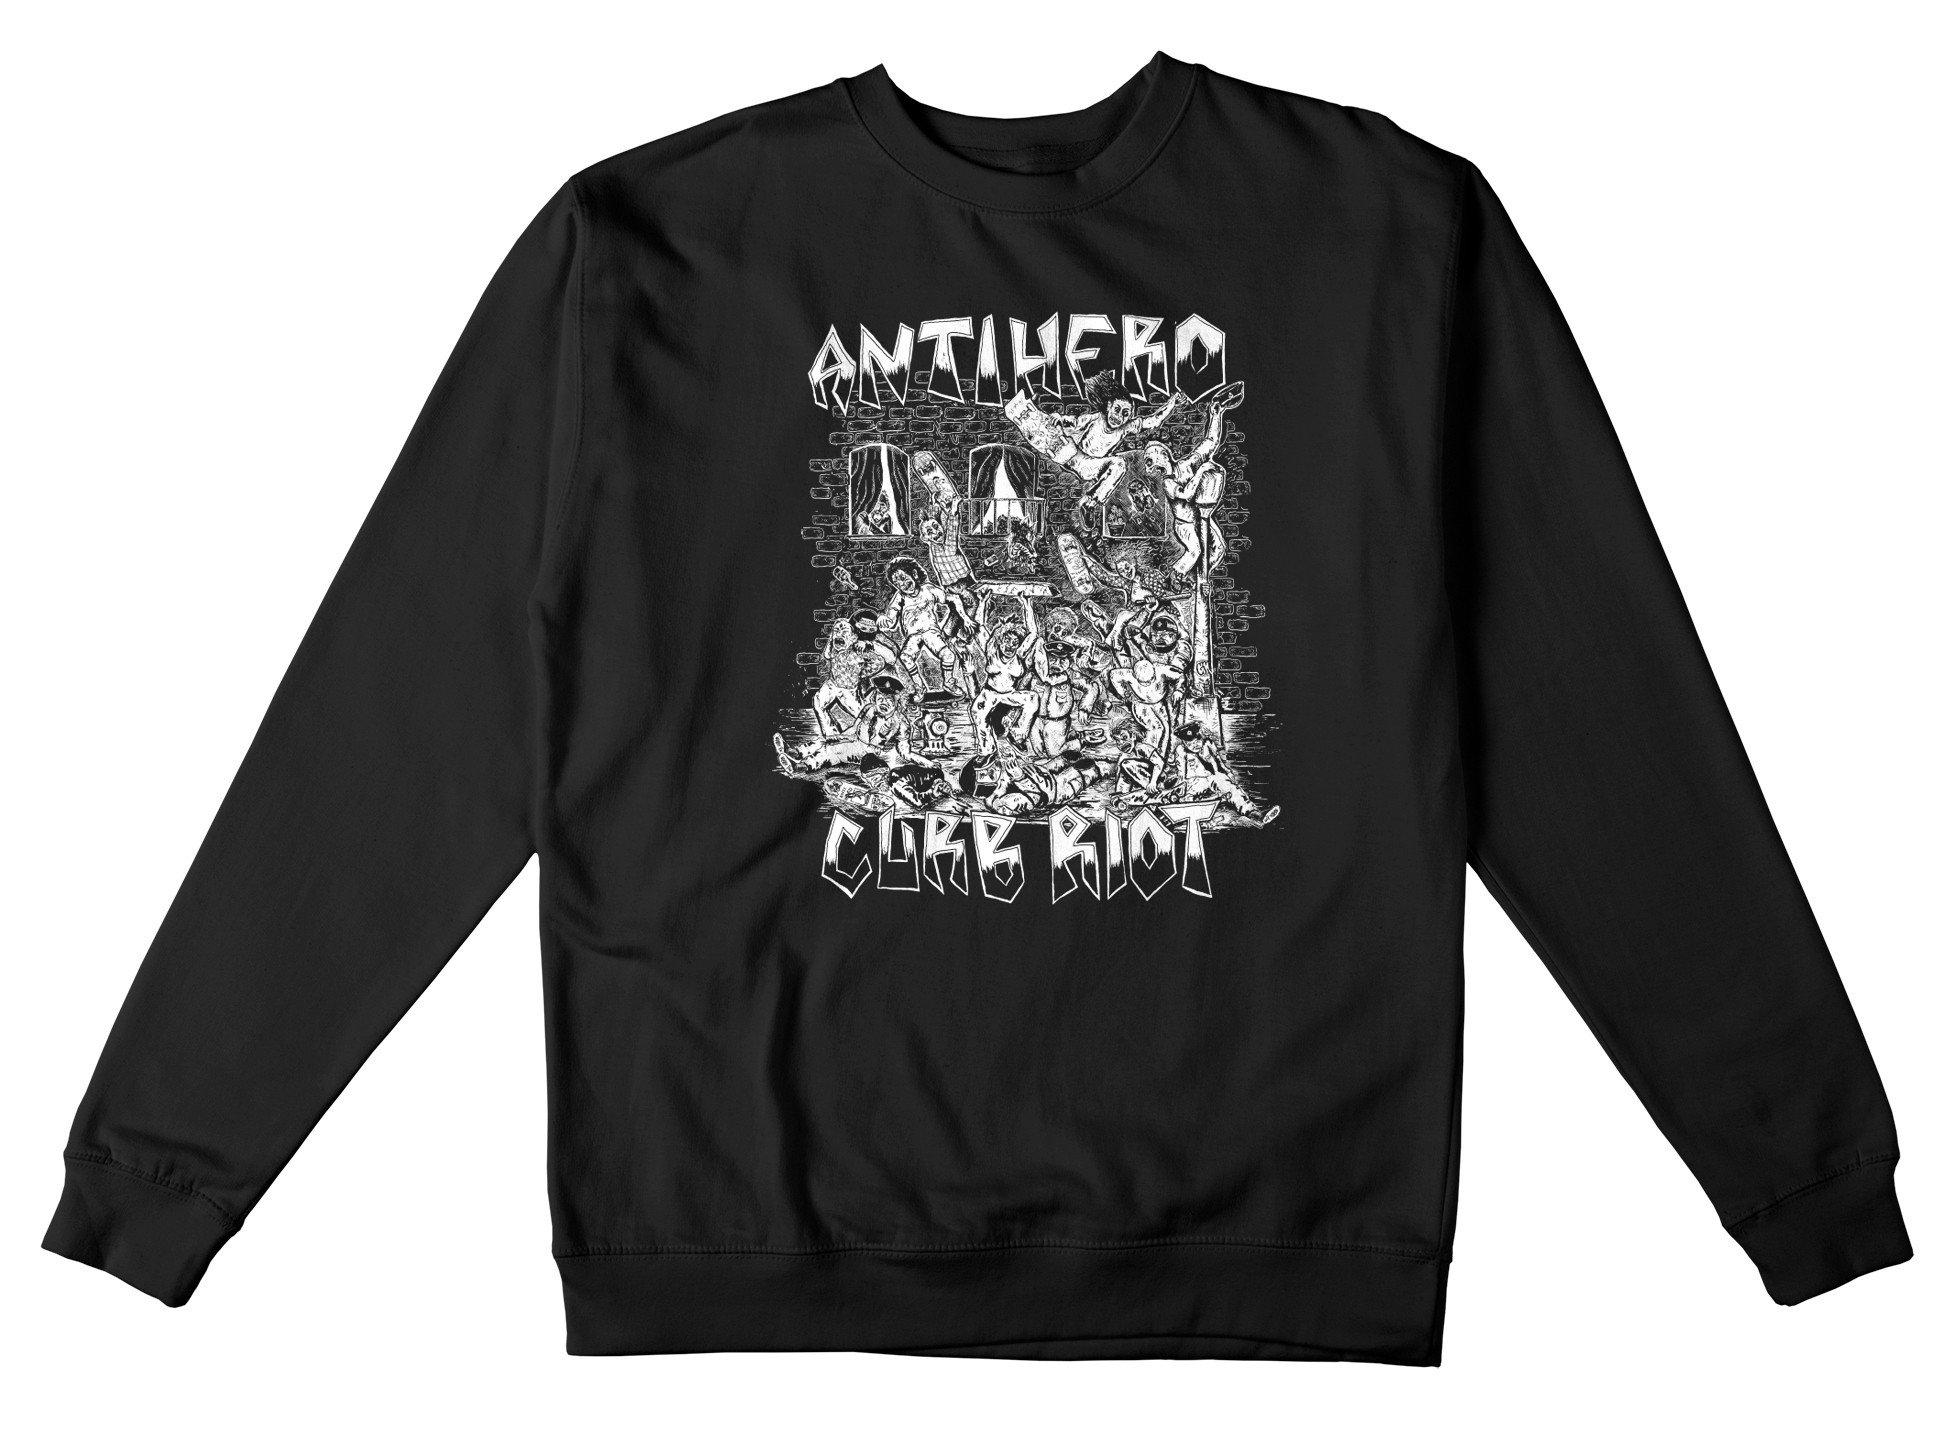 AntiHero Curb Riot Crewneck Sweatshirt black